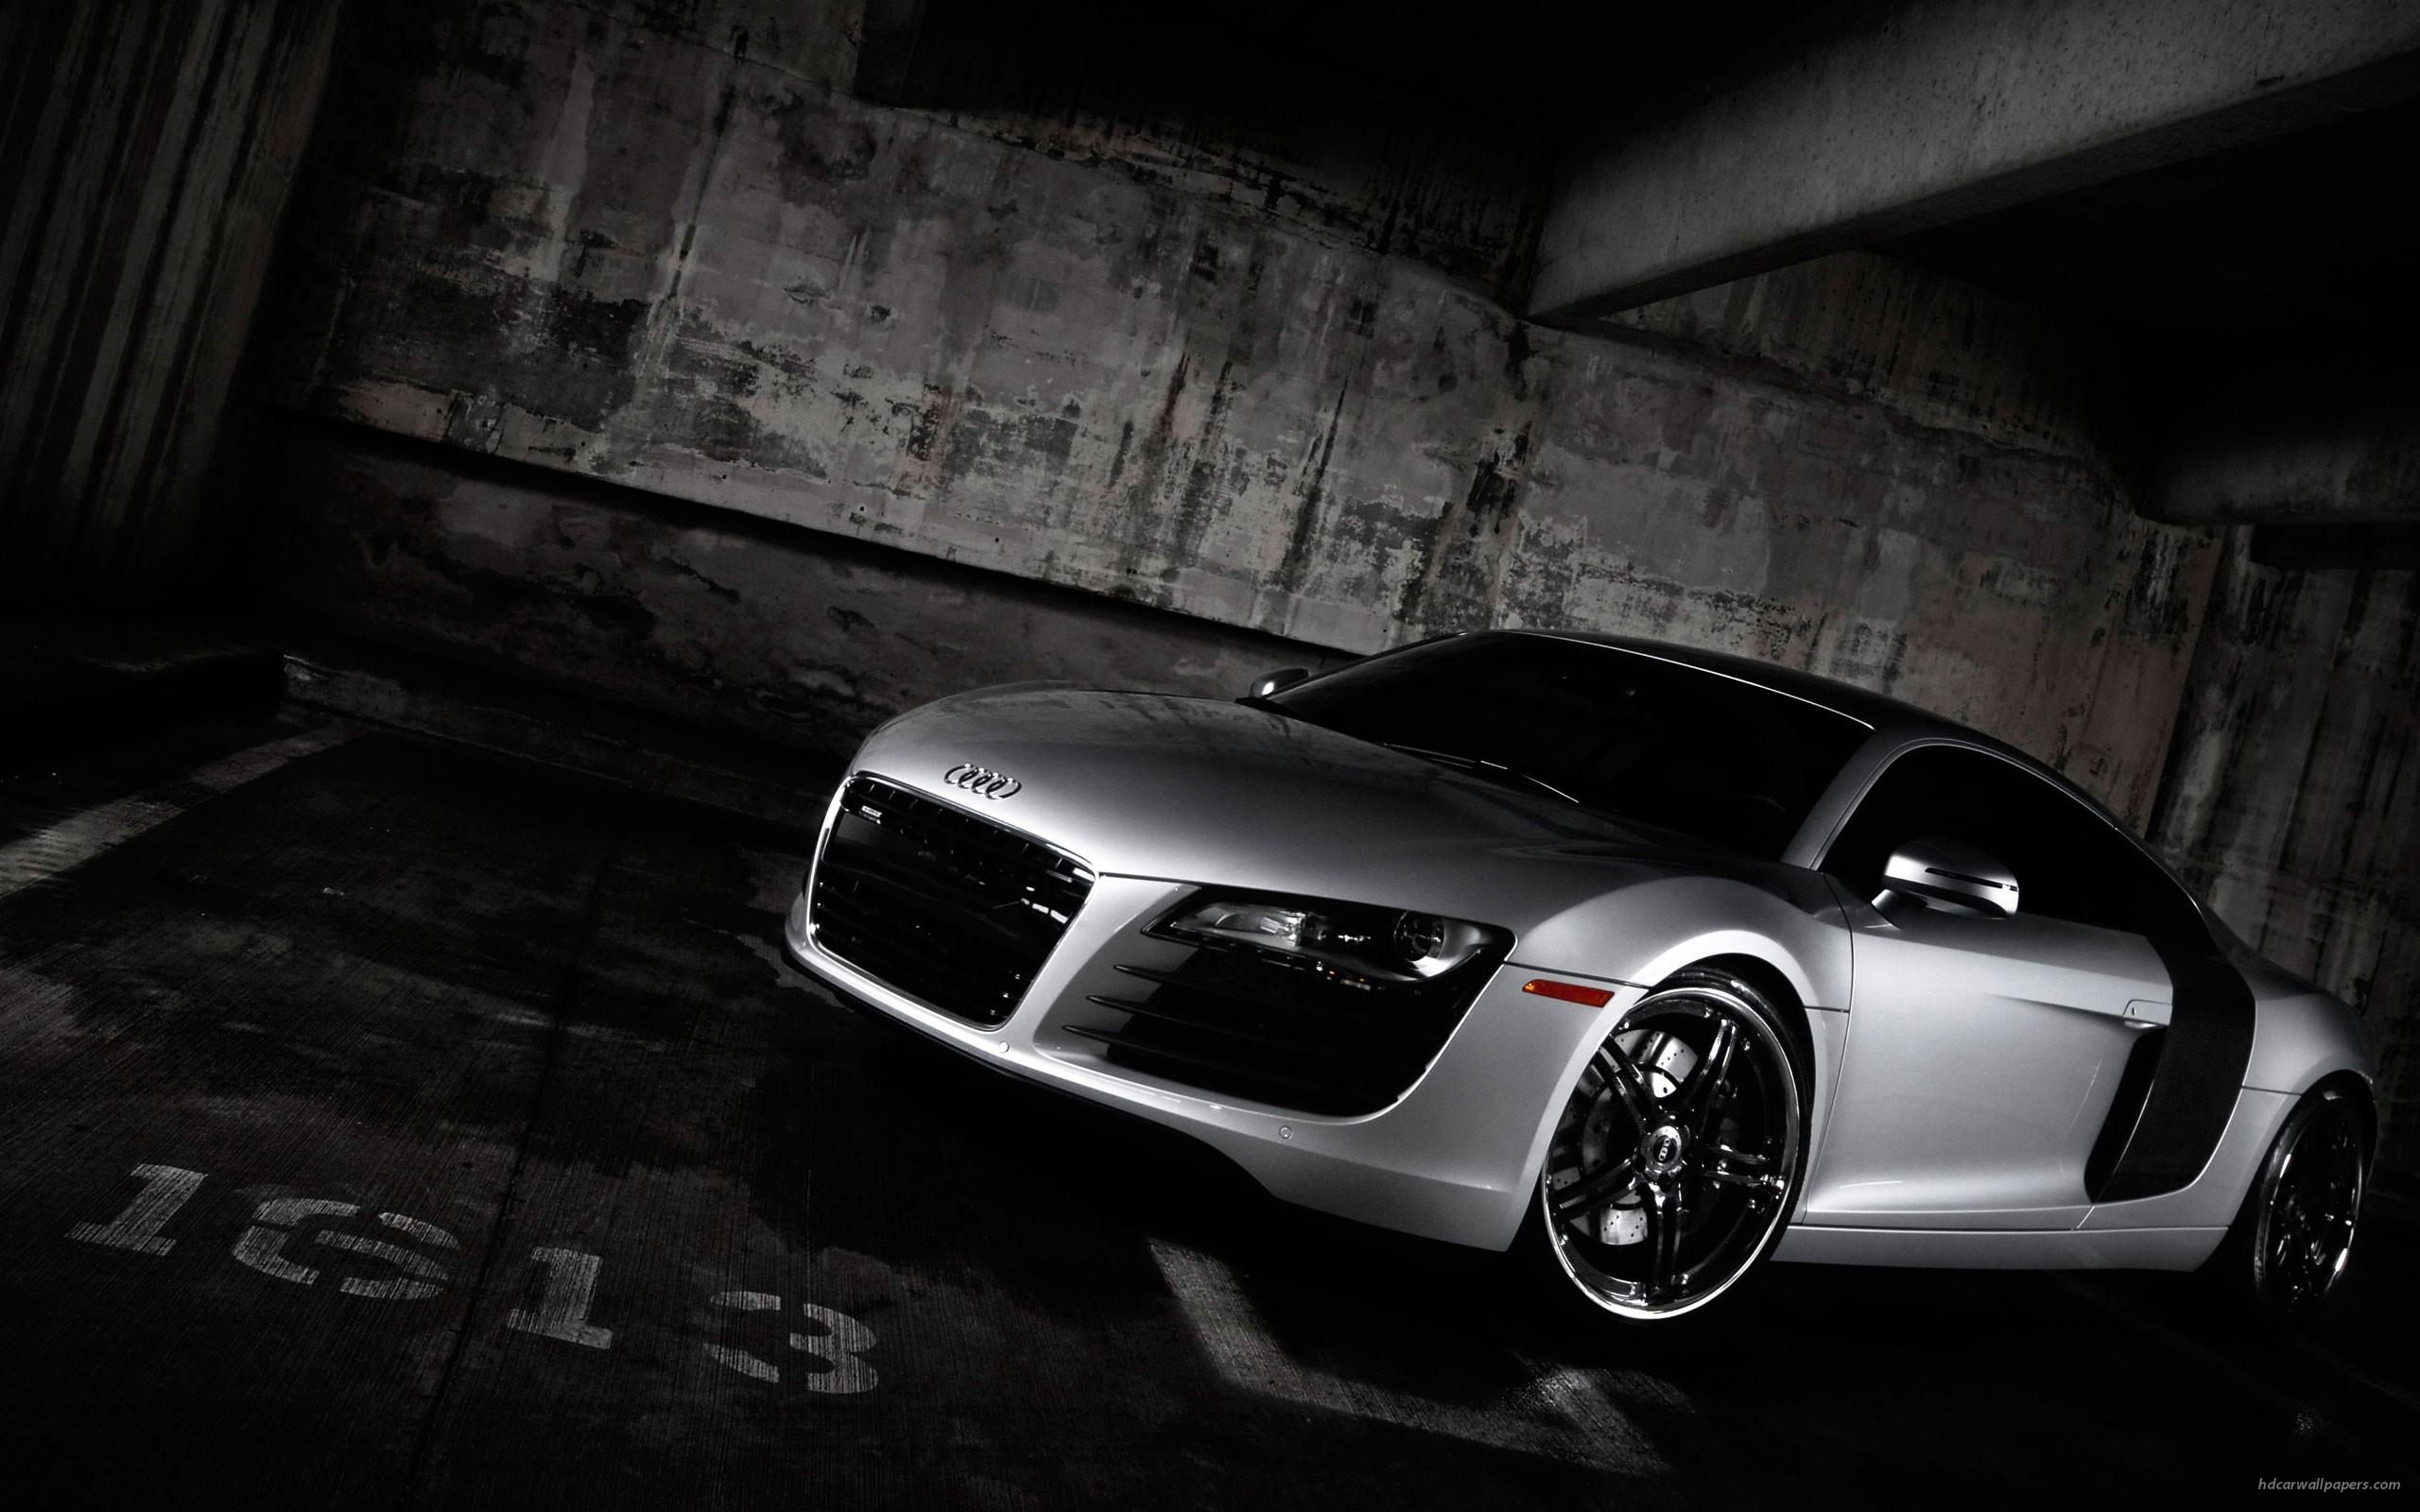 Audi R8 HD Widescreen Wallpapers HD Wallpapers 2560x1600